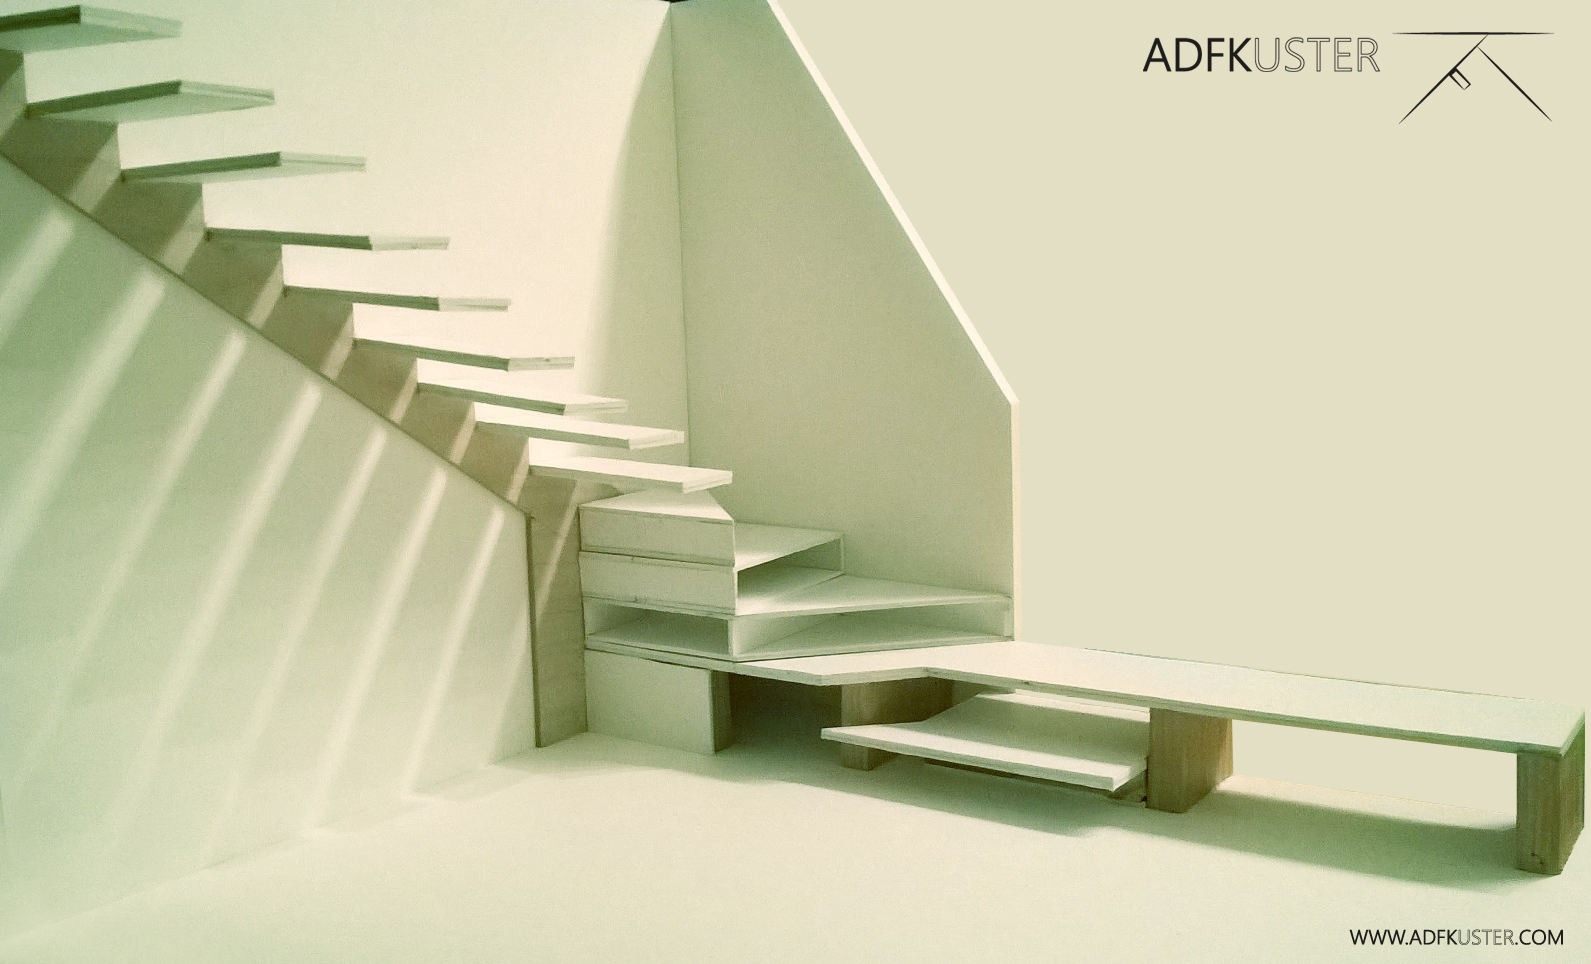 adfkcom